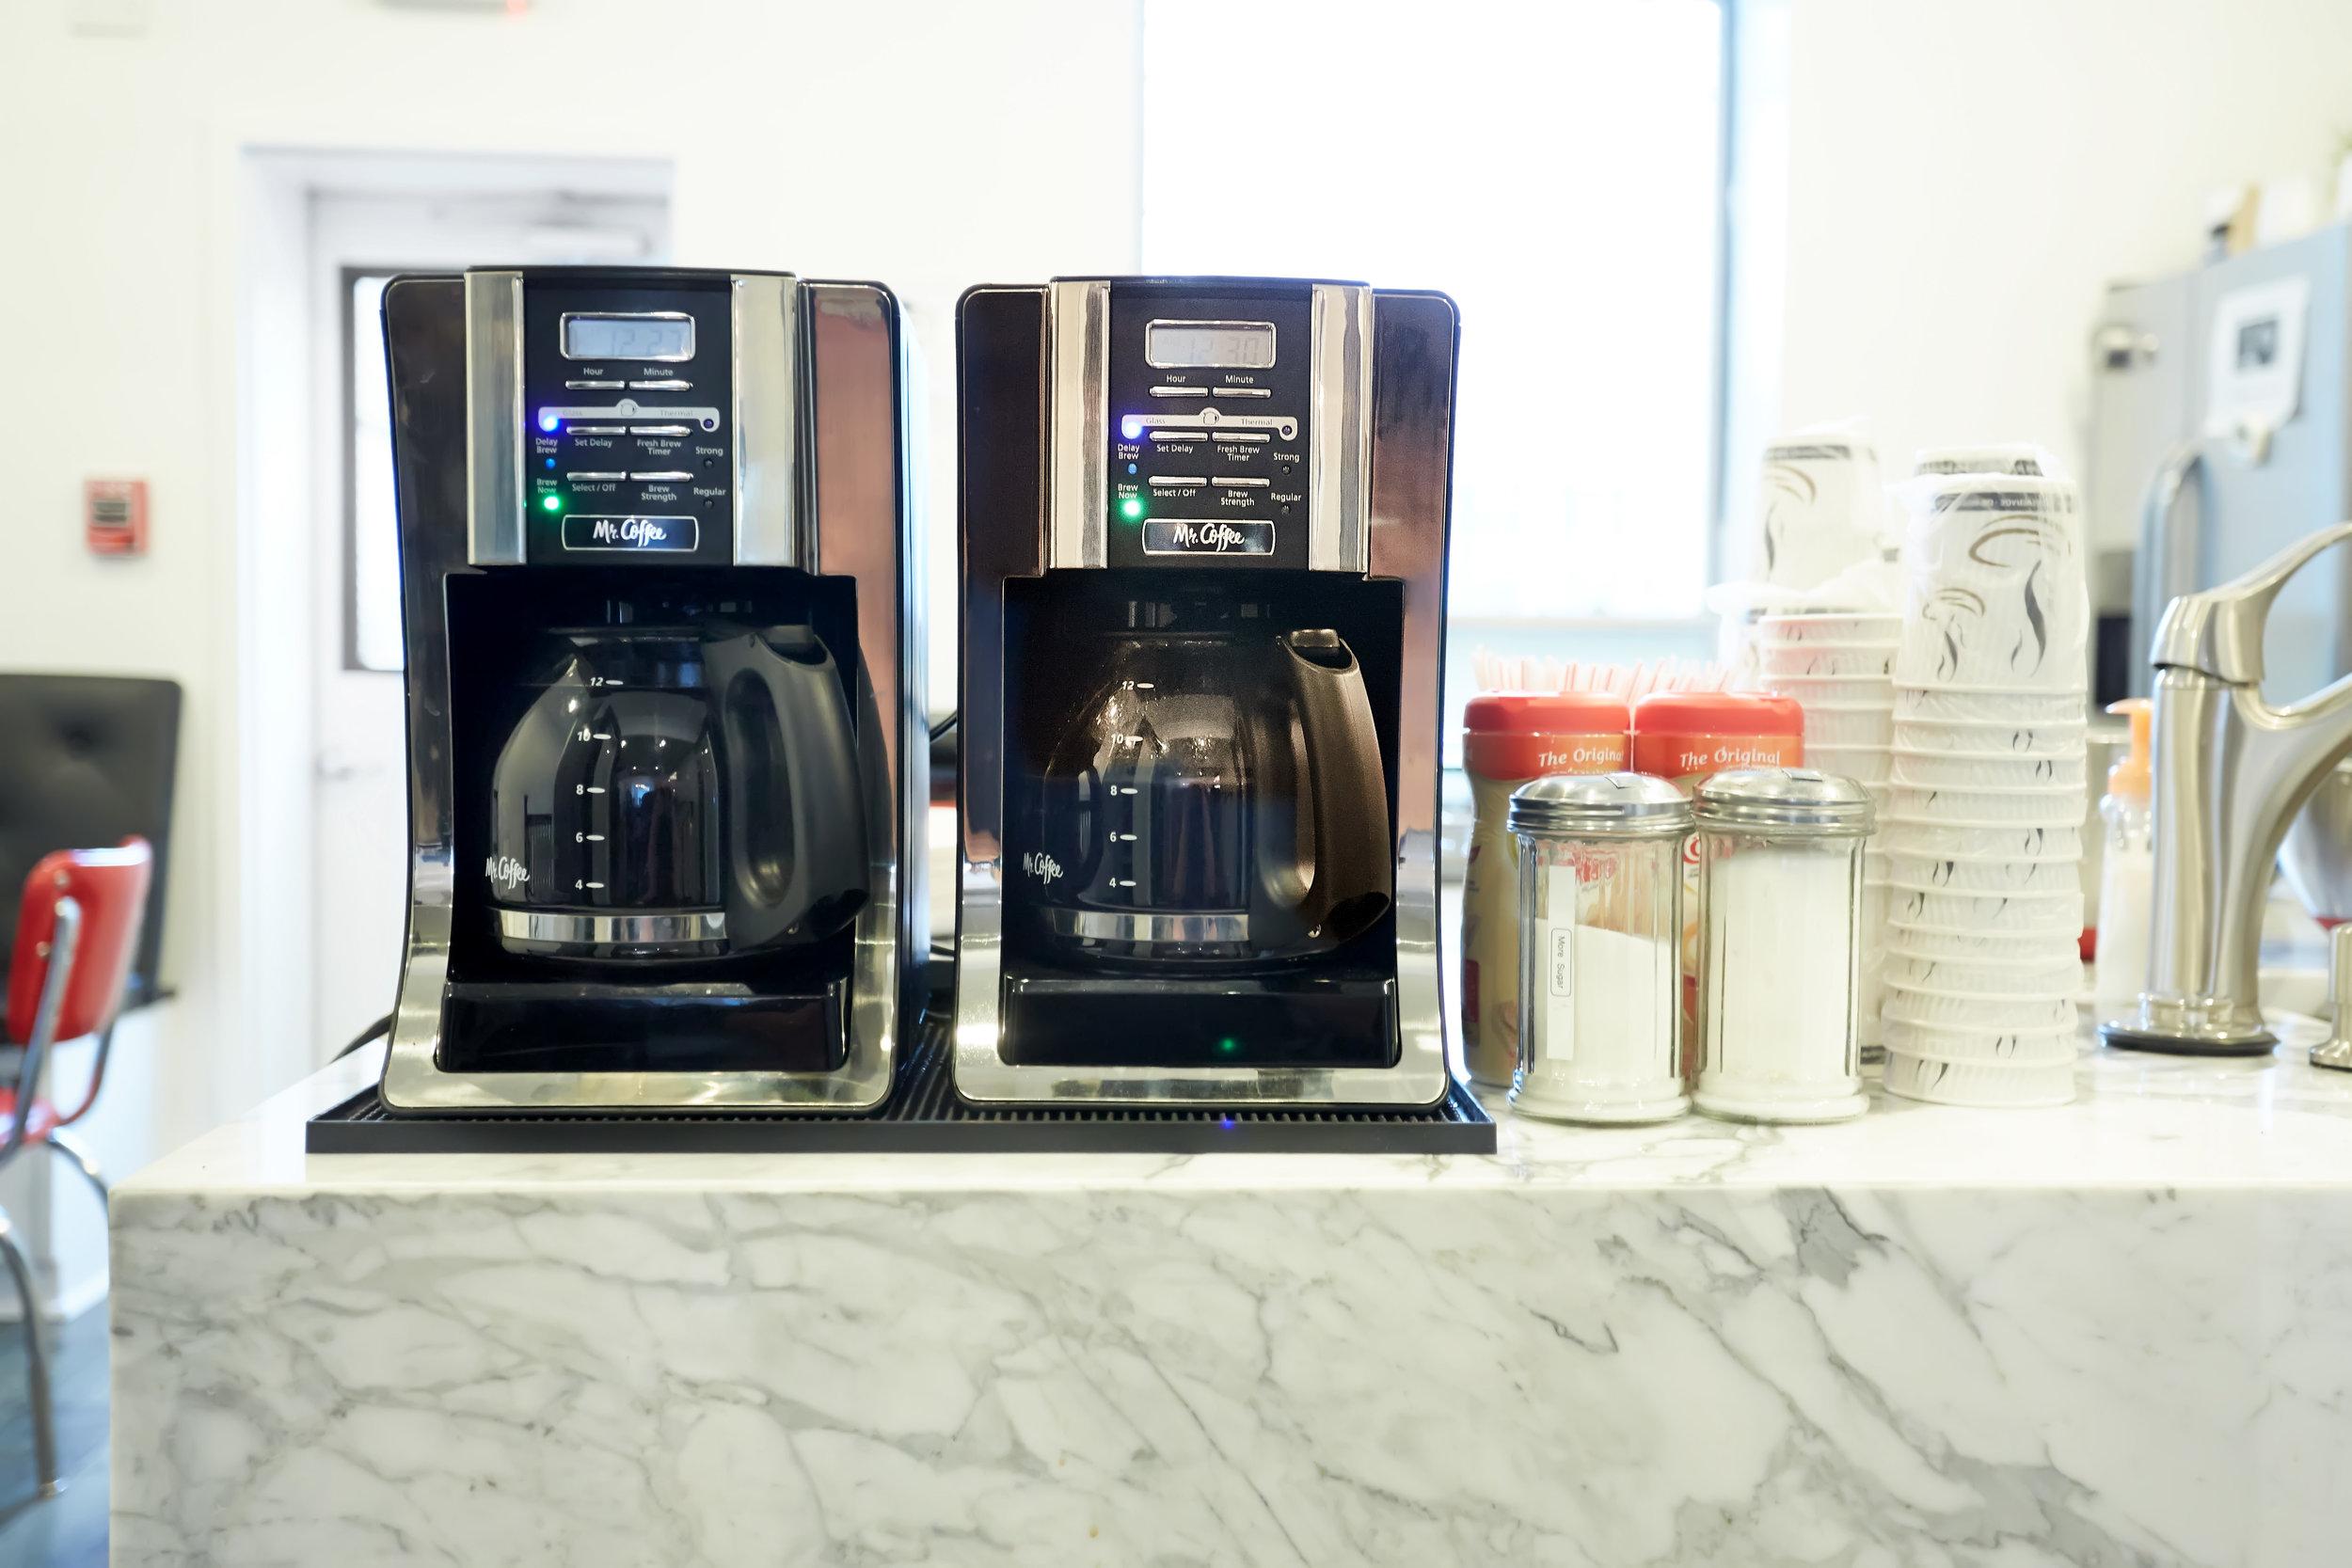 Free coffee - coffee machines